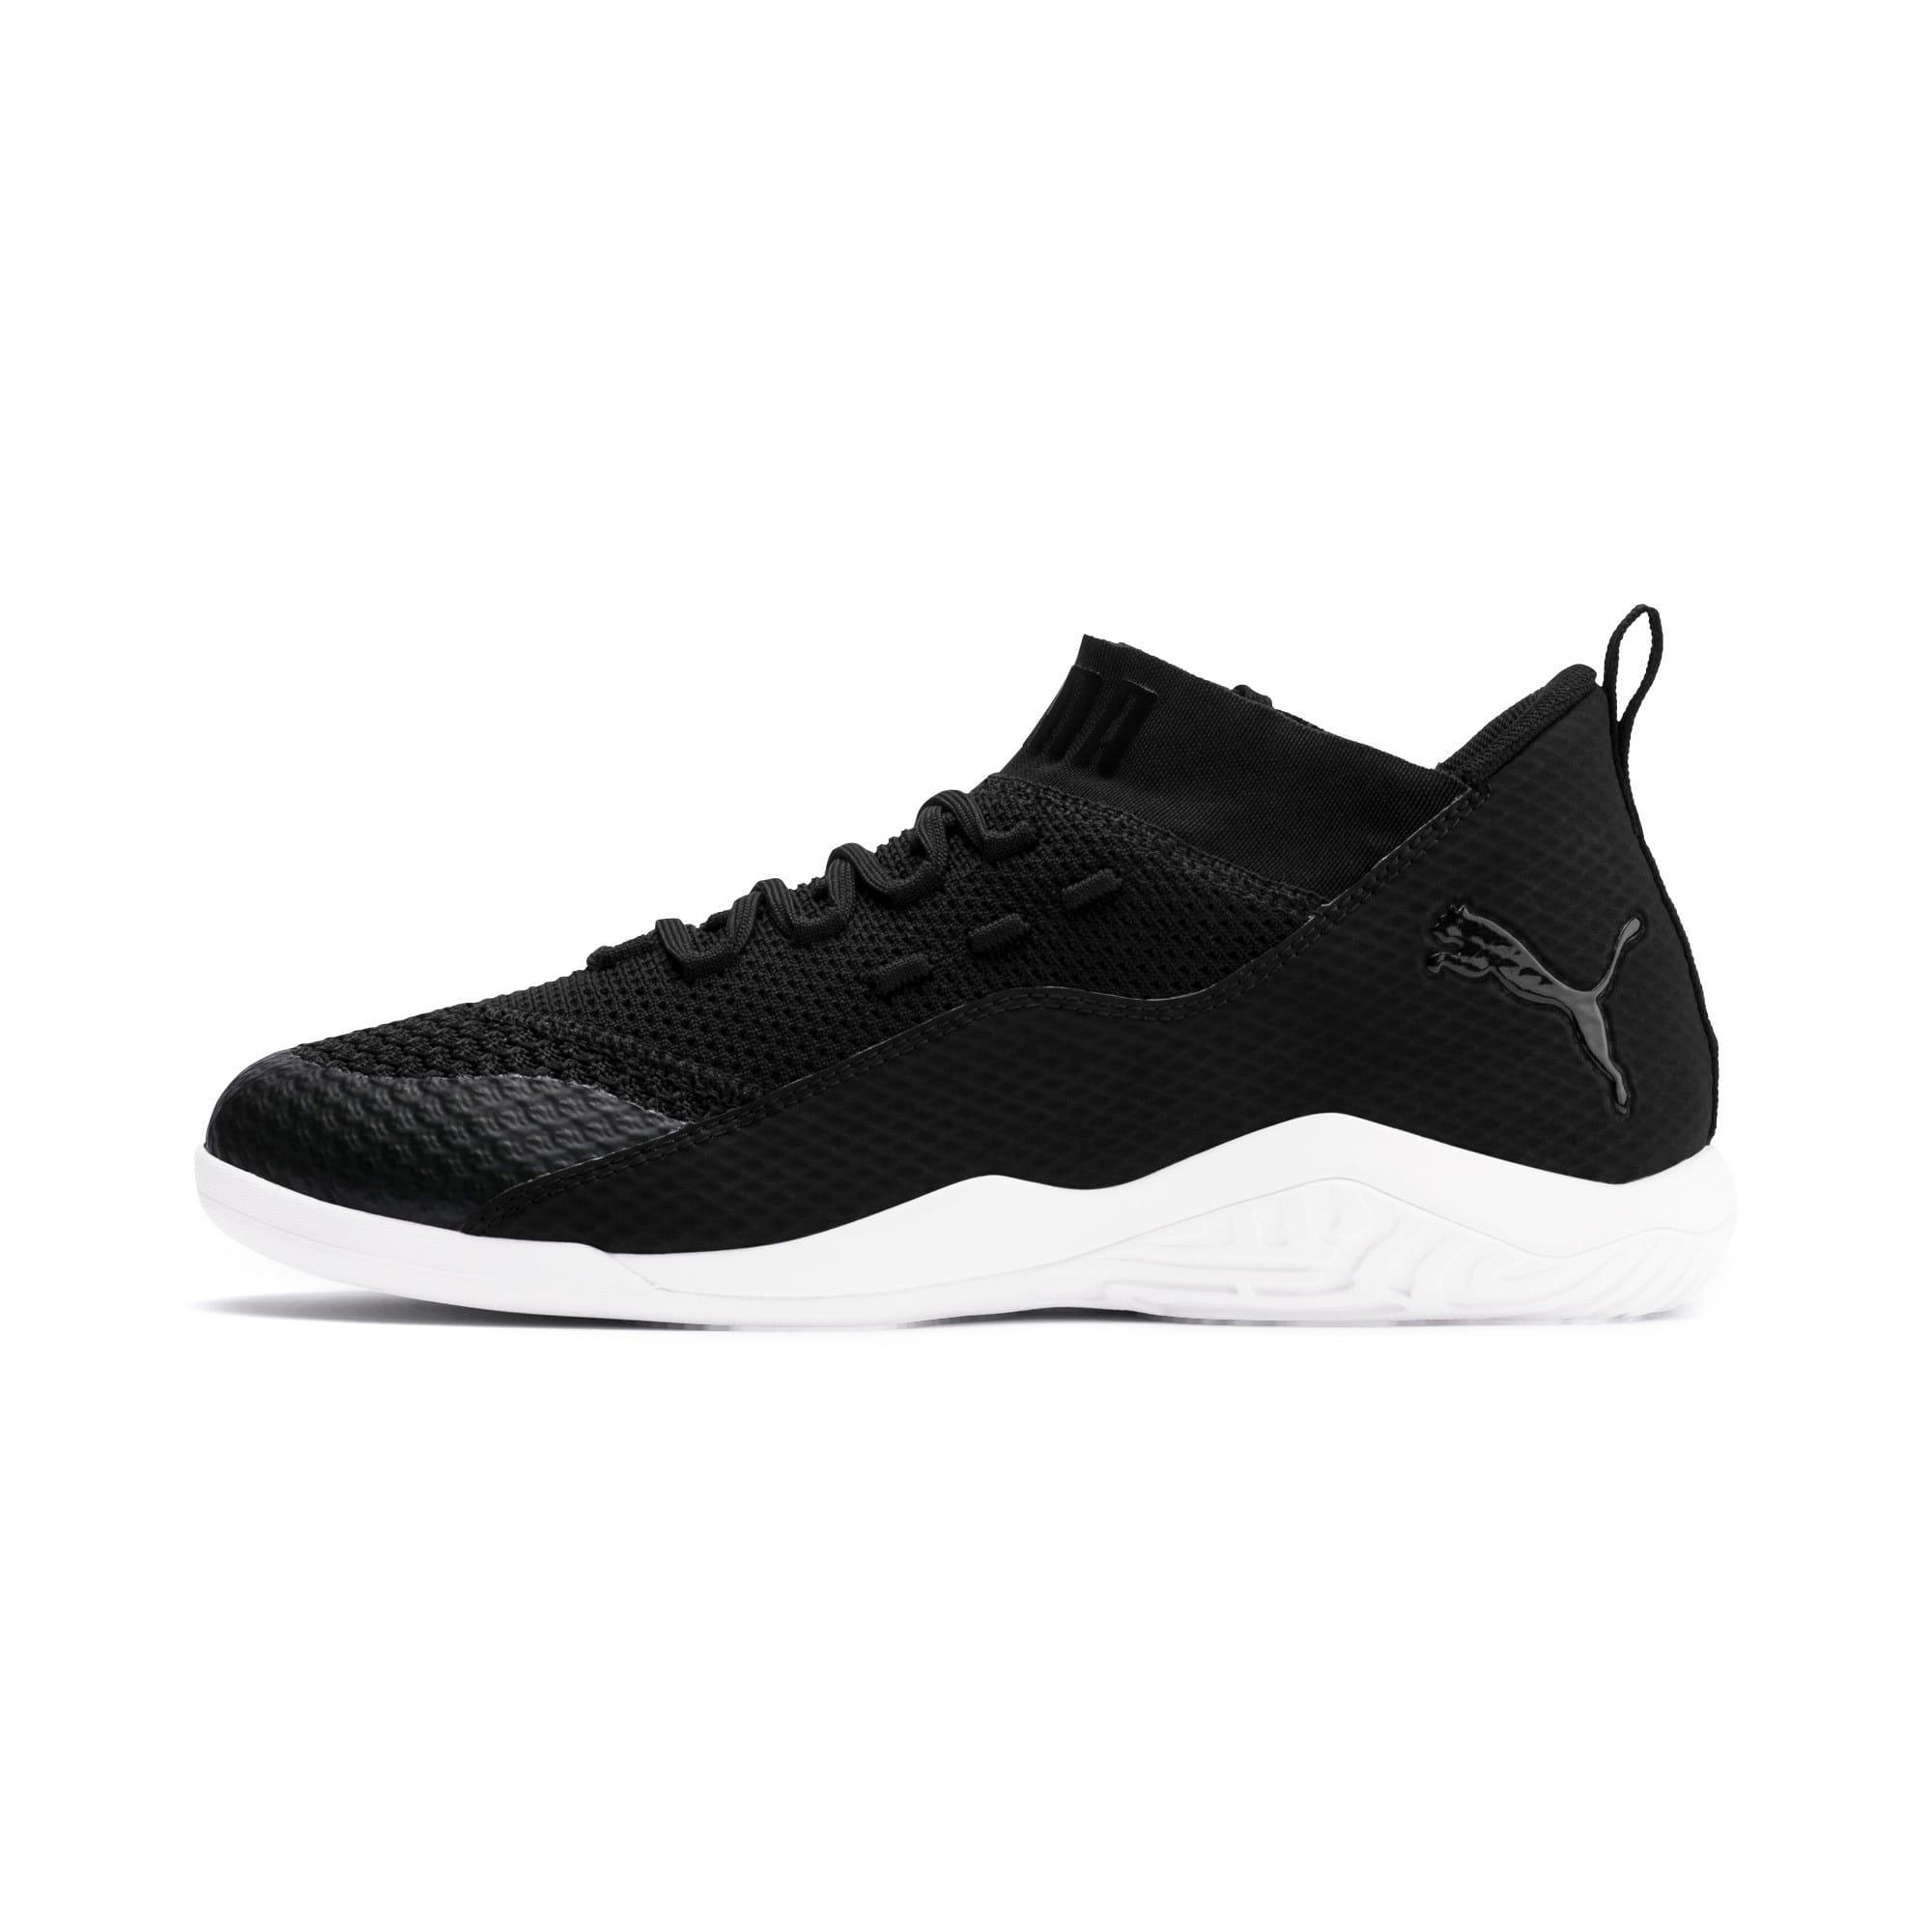 Thumbnail 1 of 365 IGNITE FUSE 2 Men's Soccer Shoes, Puma Black-Puma White, medium